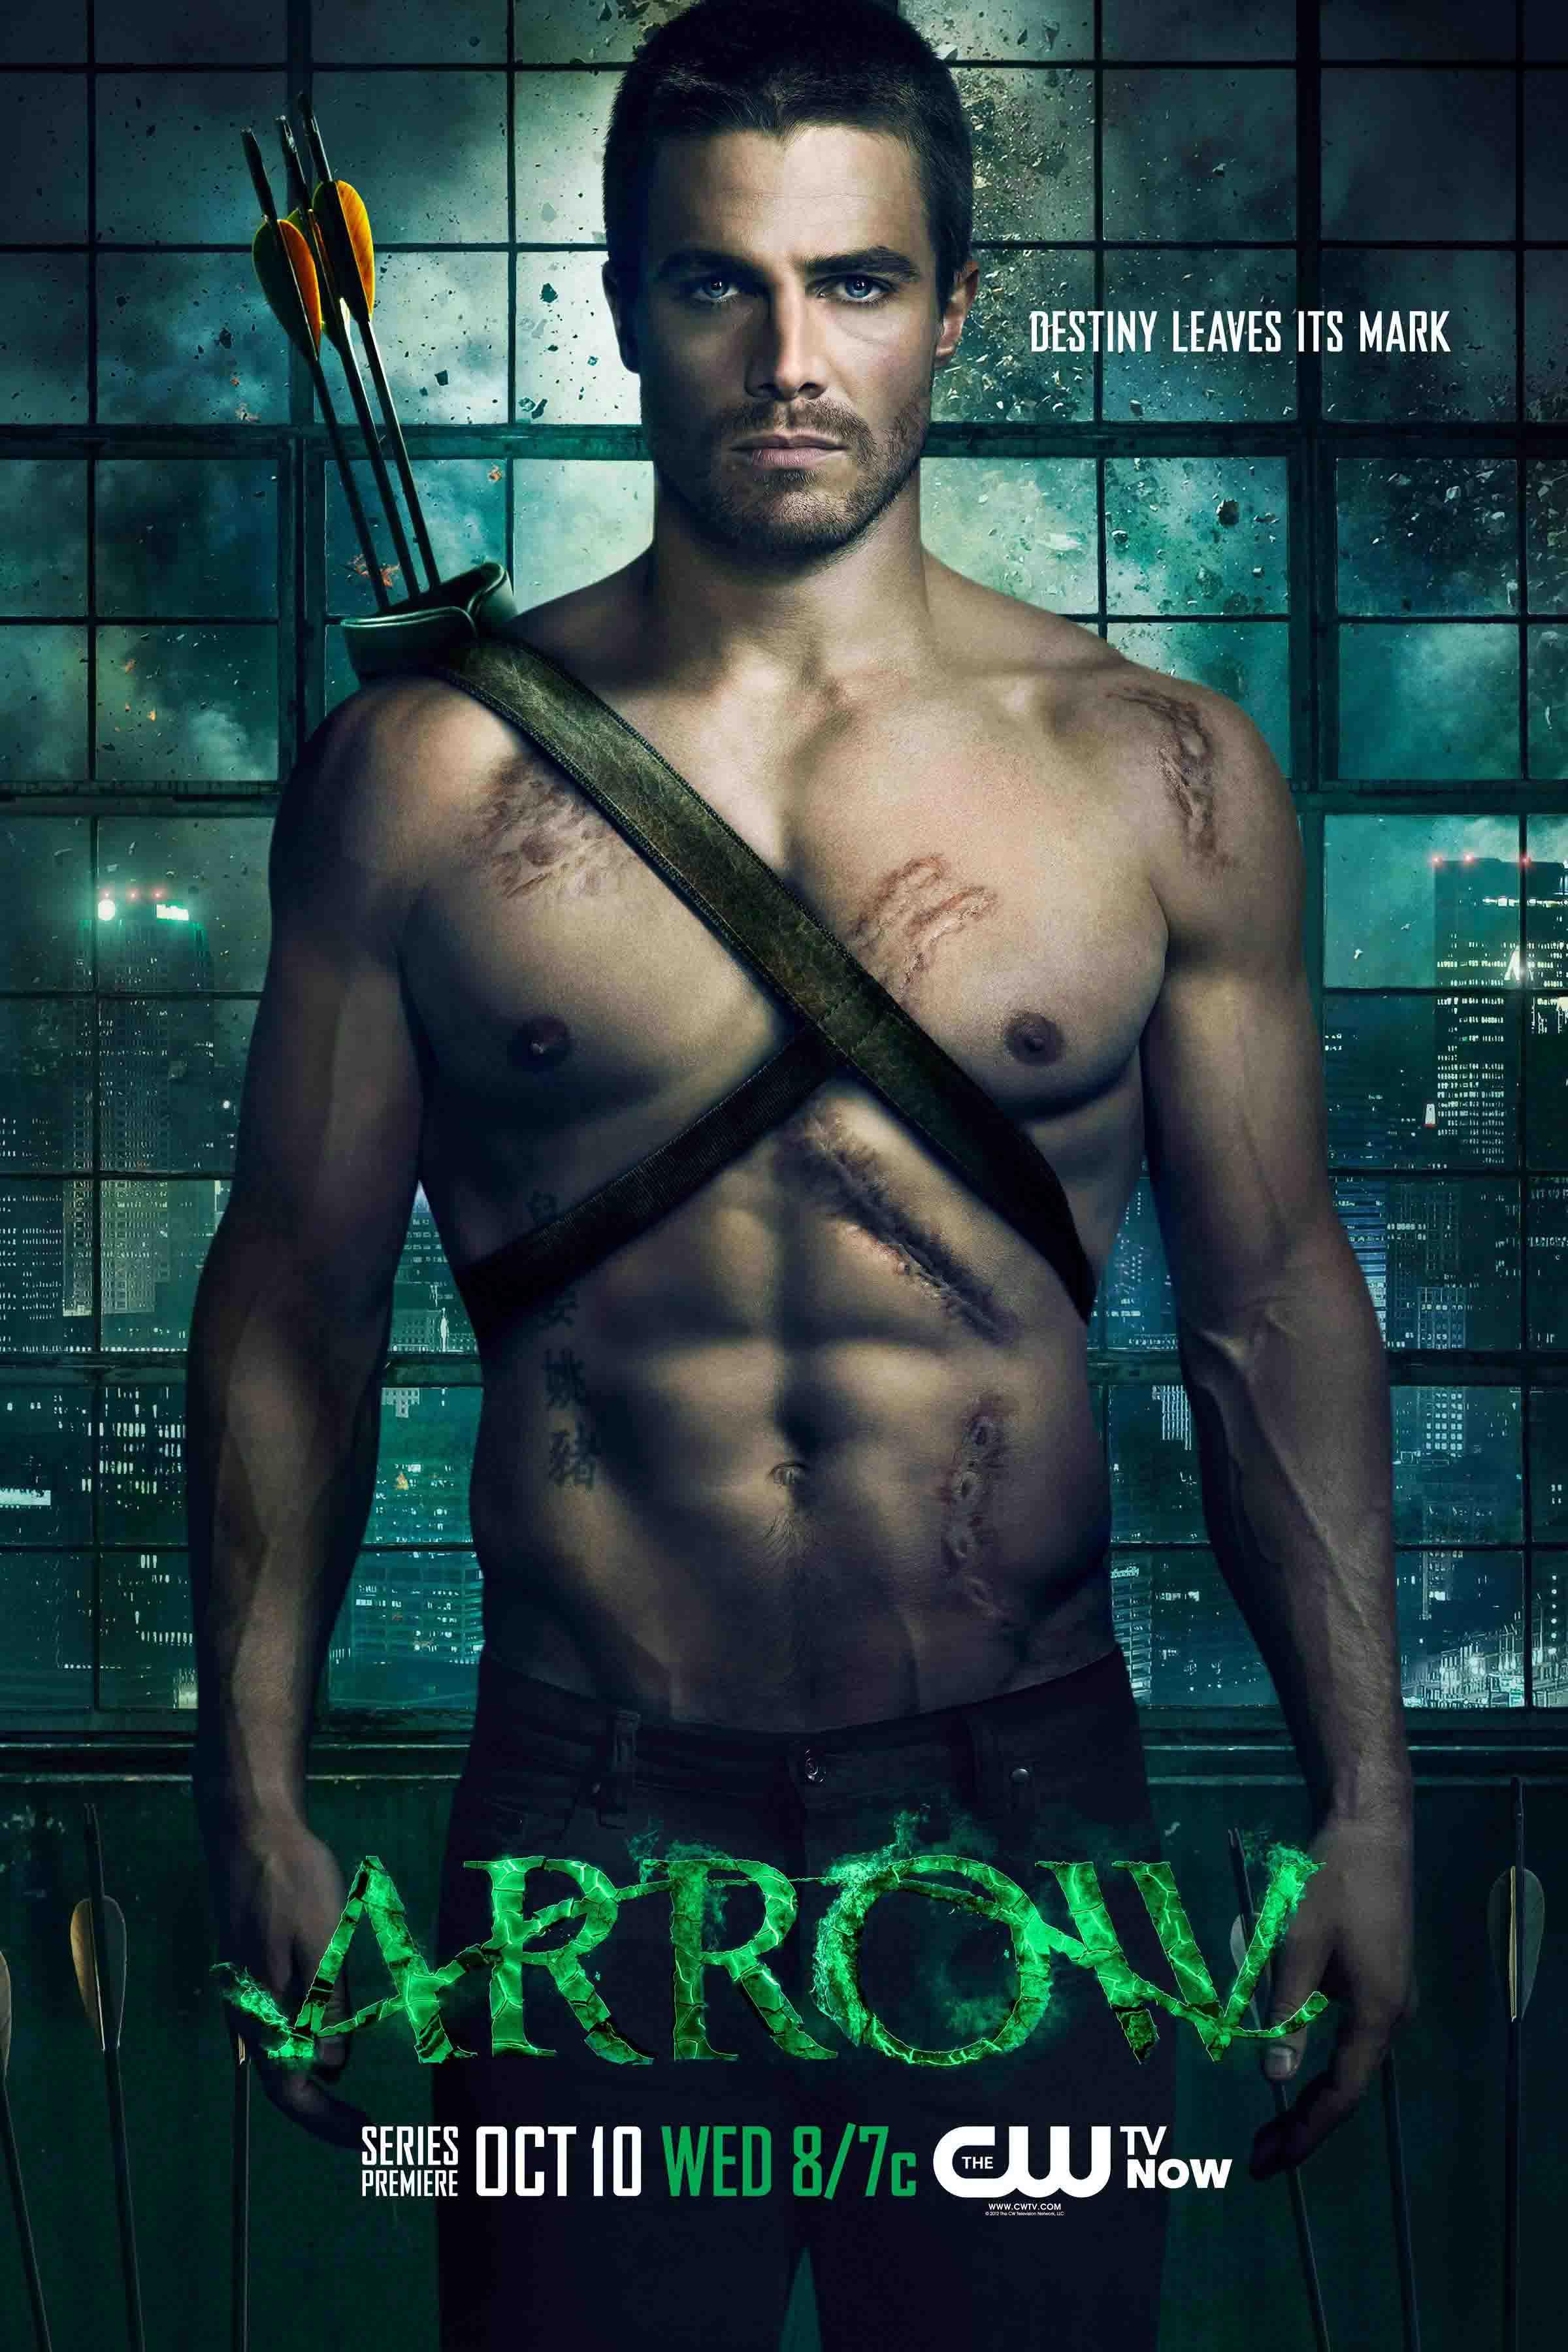 CW放弃DC《绿箭侠》衍生剧《绿箭侠与金丝雀》